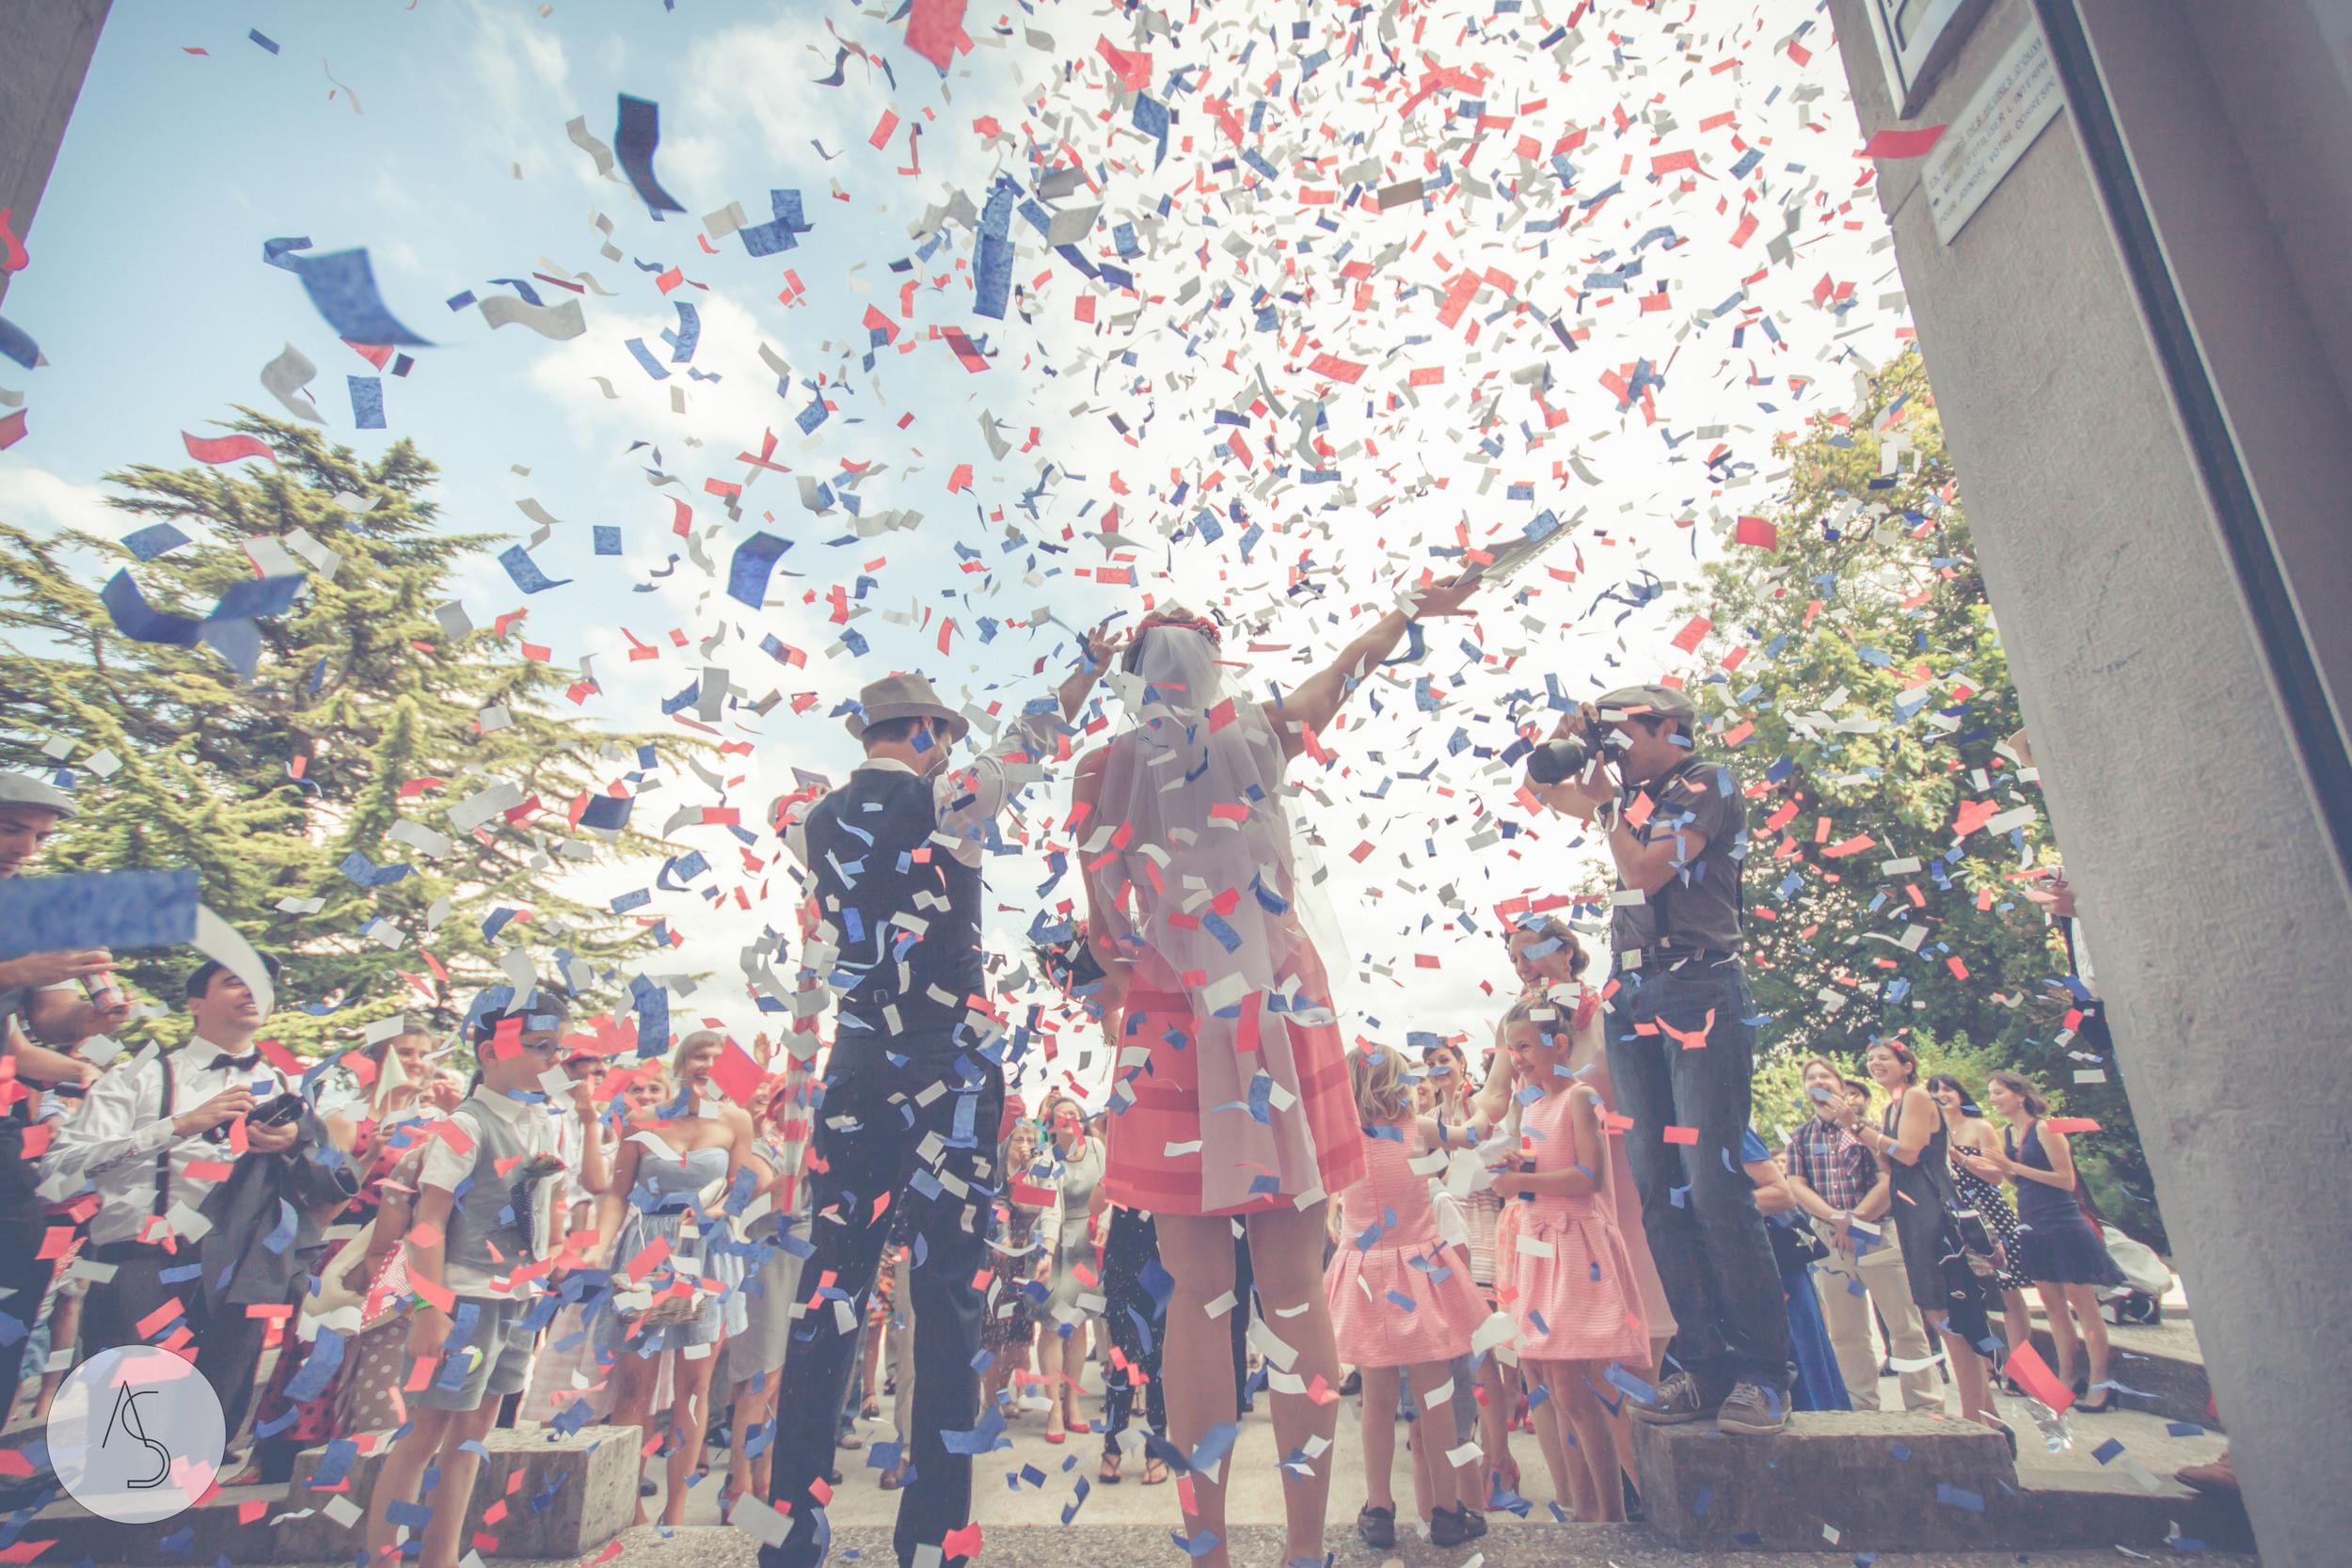 photographe mariage - Grenoble - Rhone Alpes - Adriana Salazar photo-79.jpg